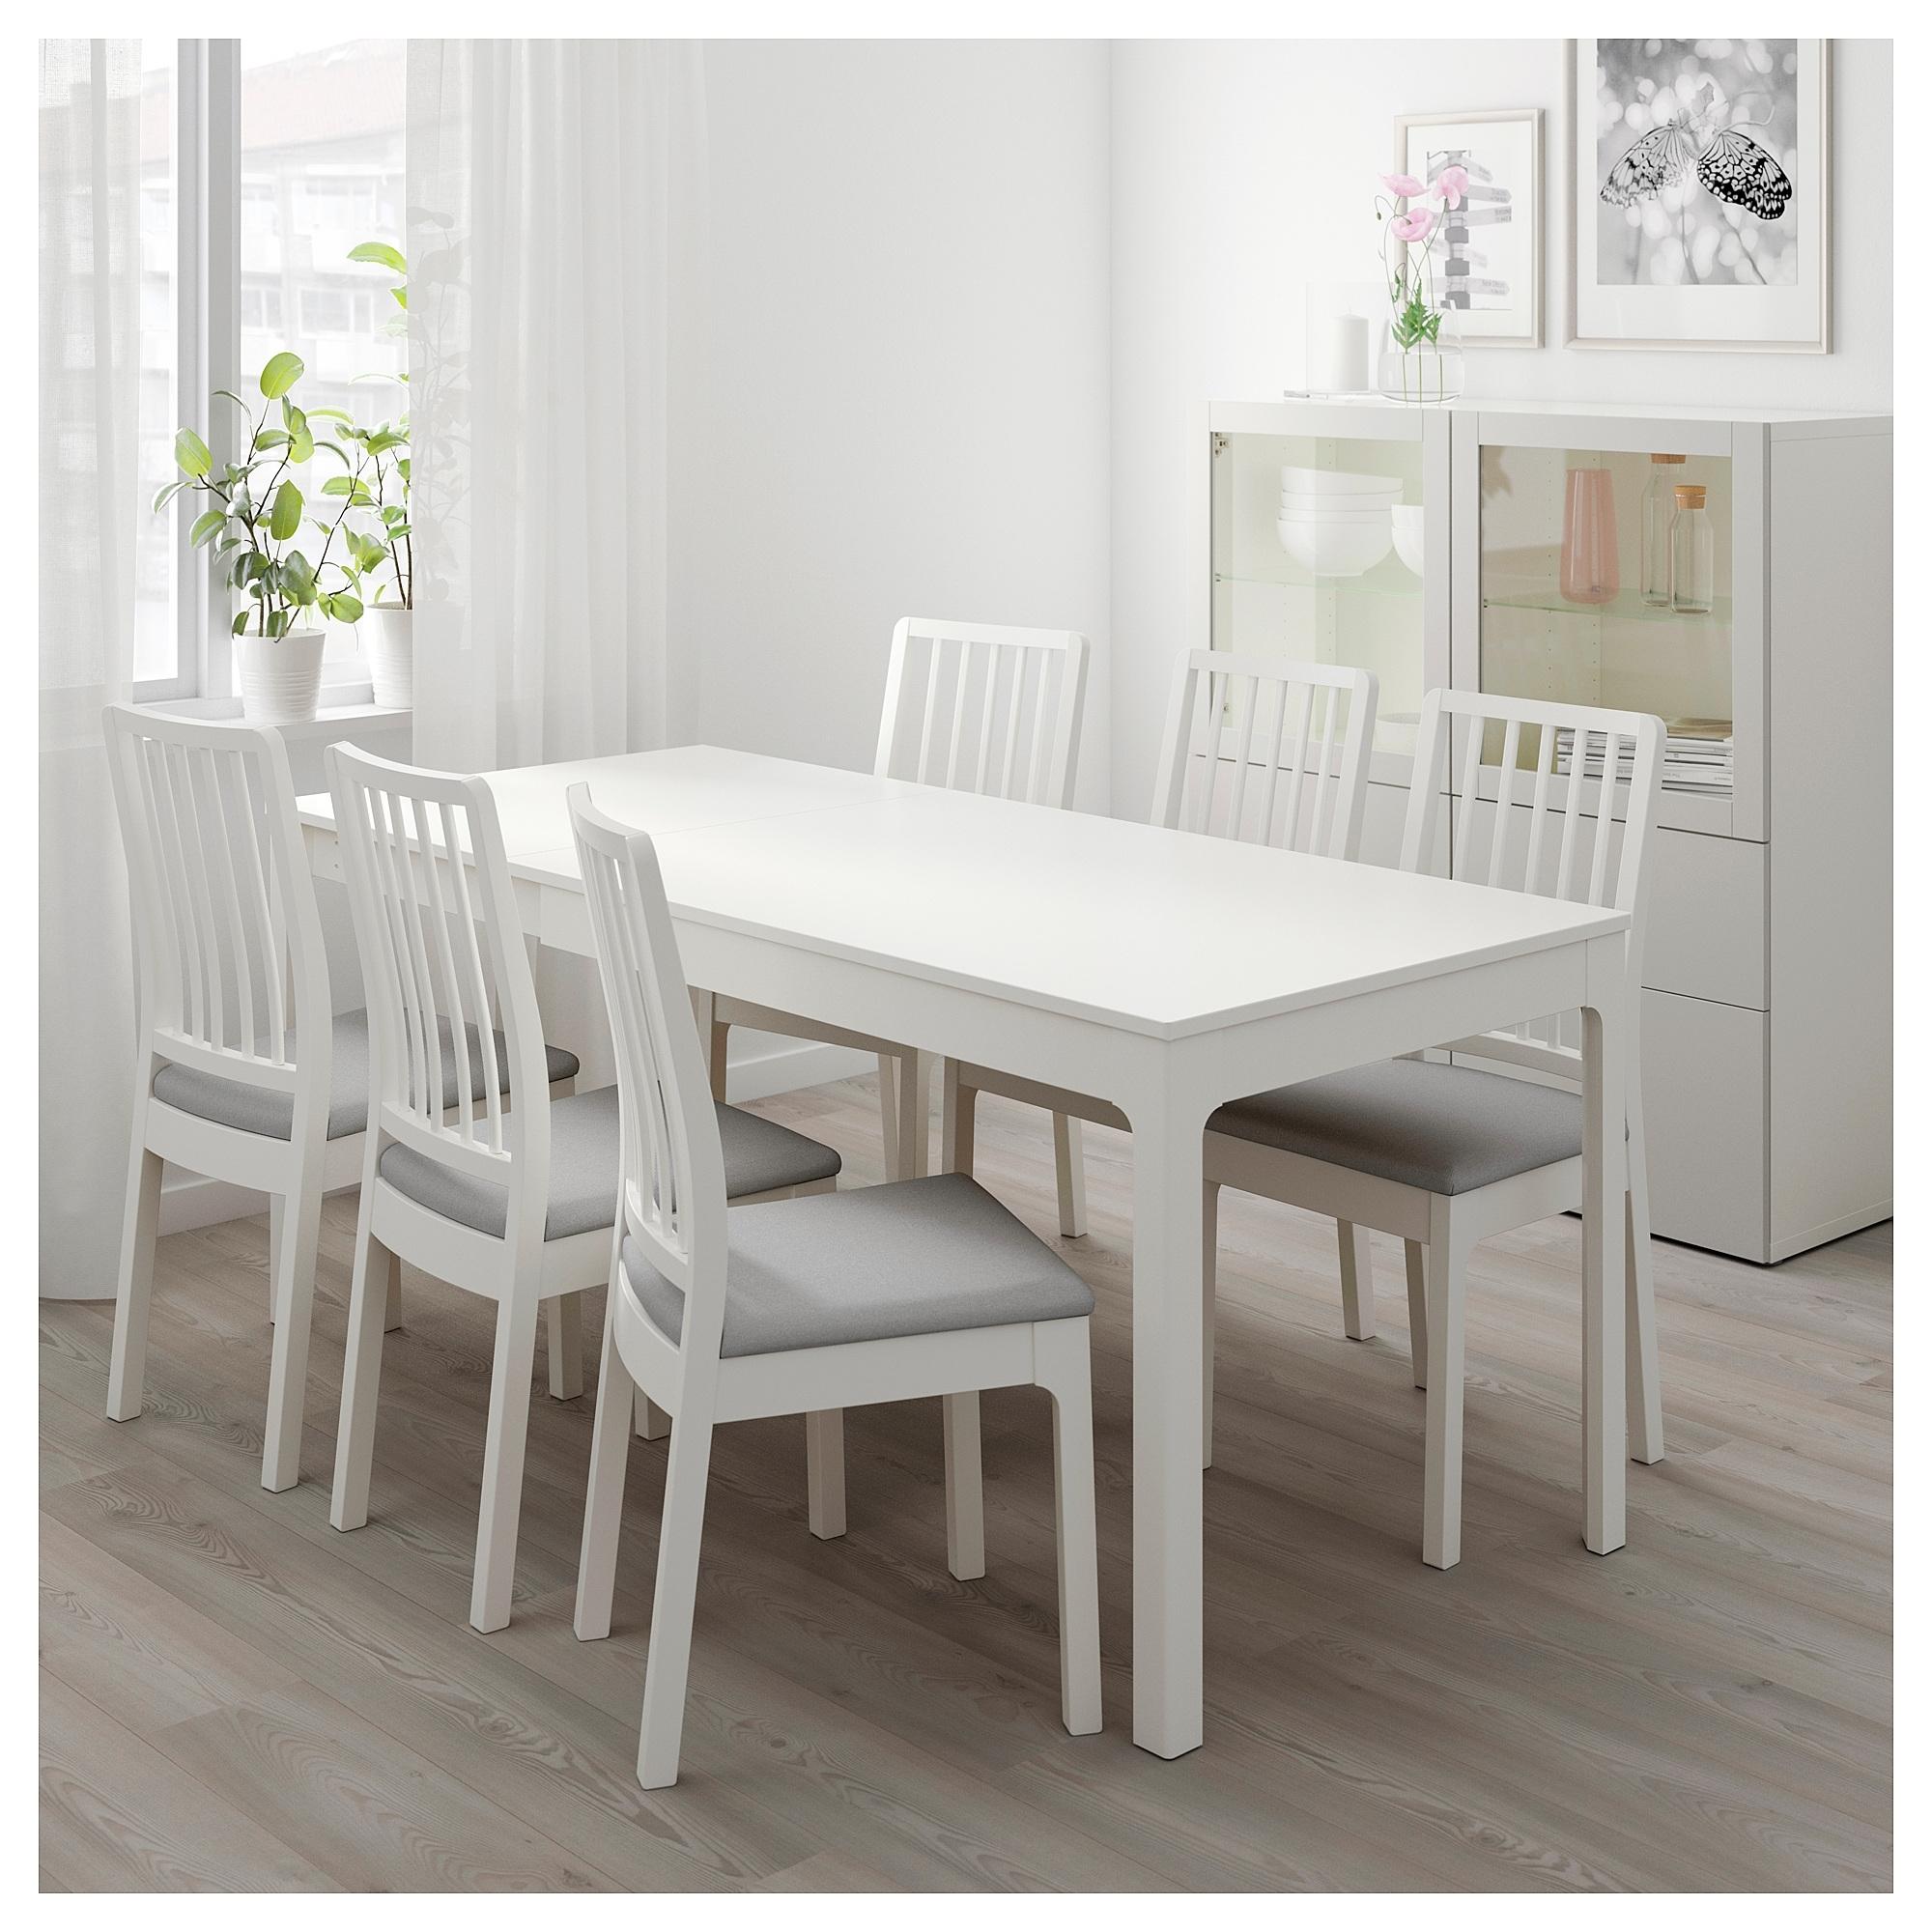 Tavoli E Sedie Da Pranzo Ikea